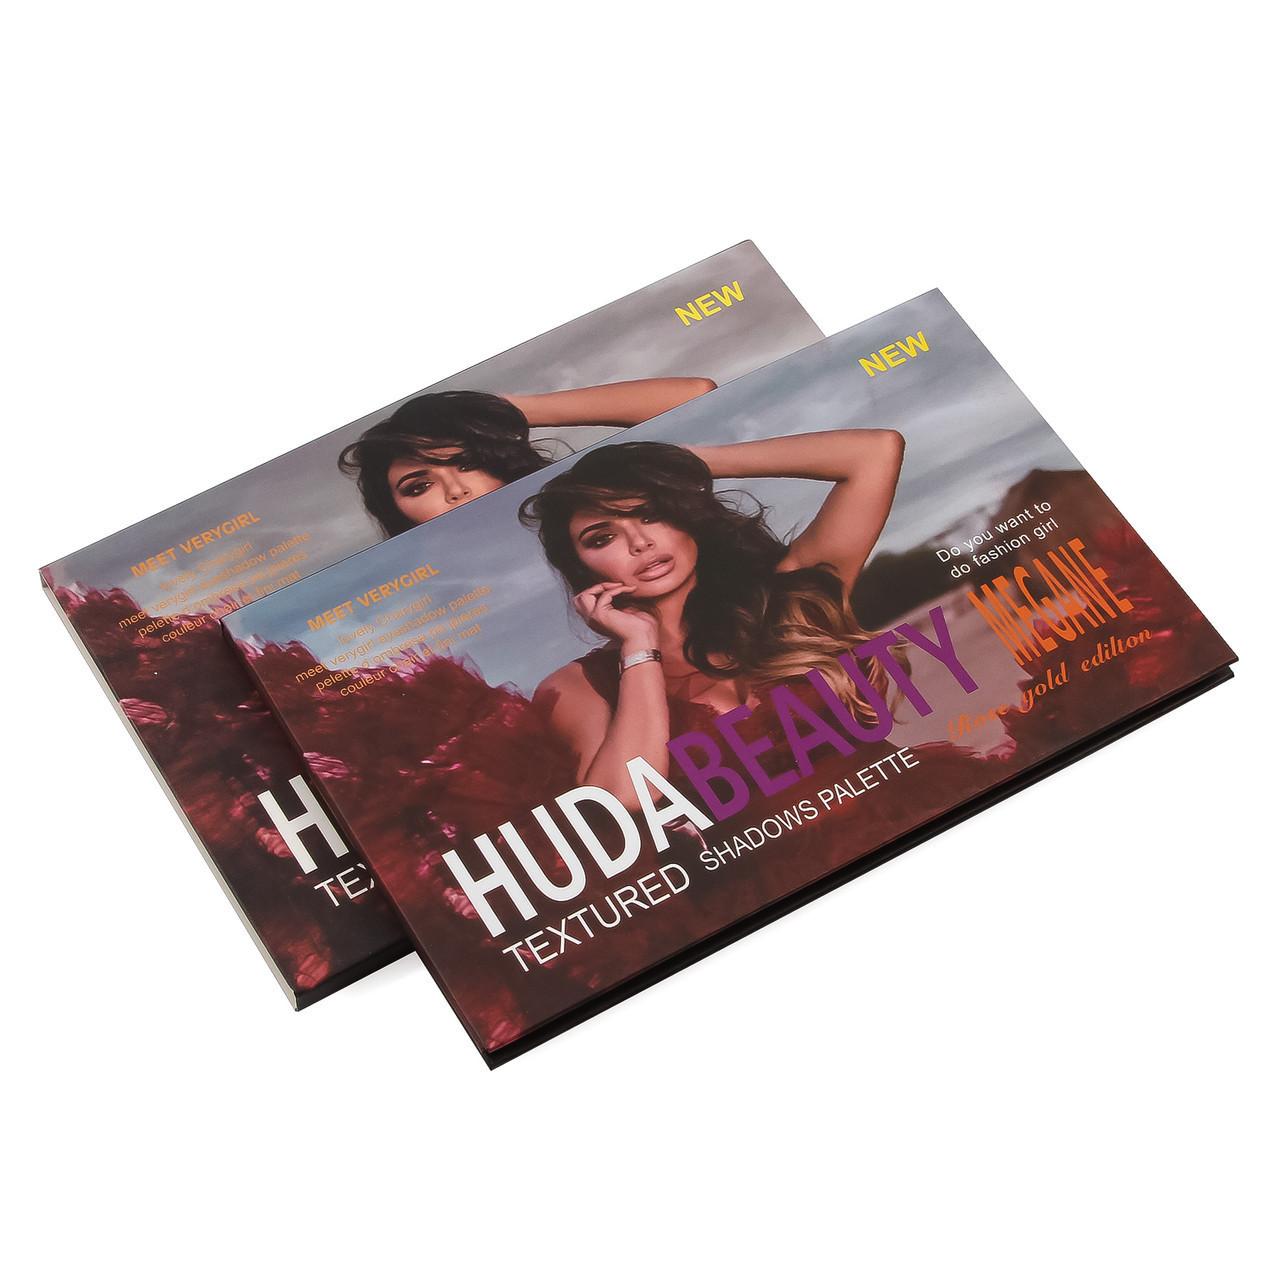 Huda Beauty Textured Shadows Palette (Rose gold edition) МЯТАЯ УПАКОВКА